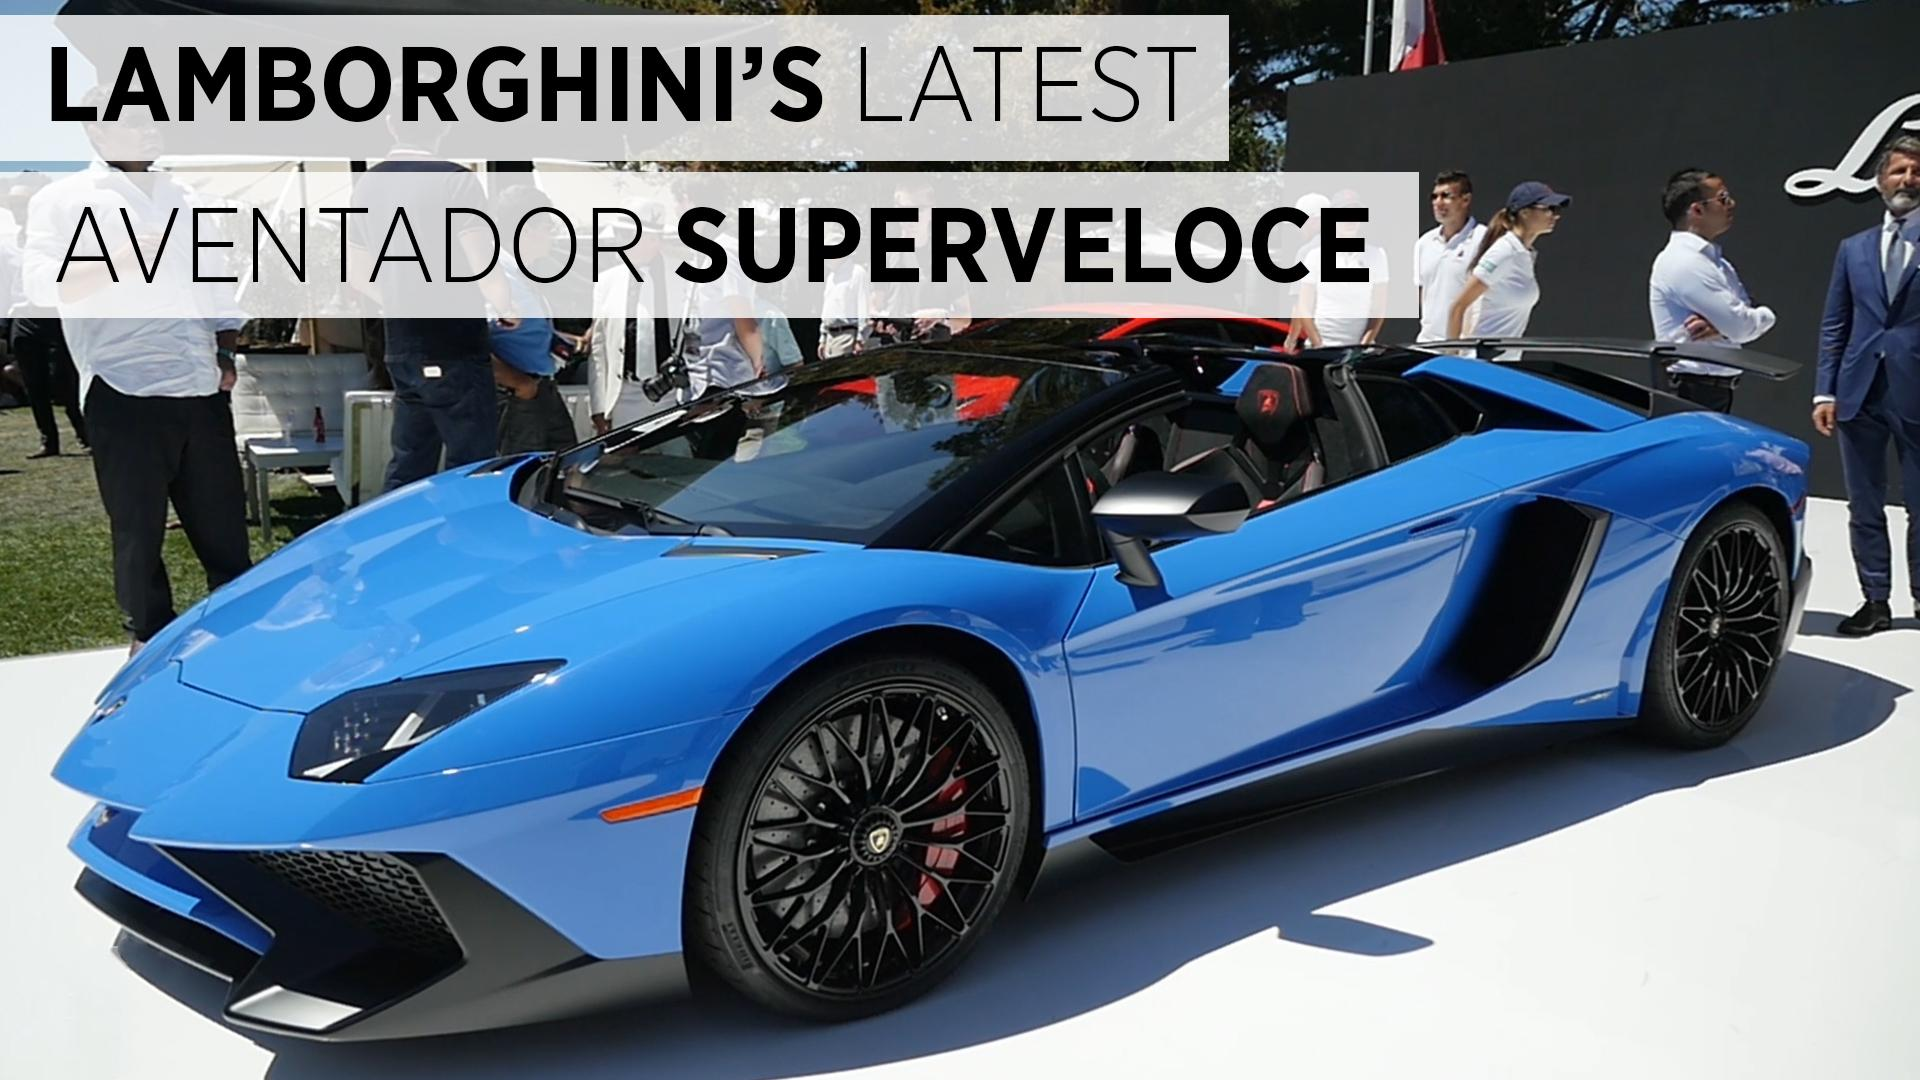 Lamborghini's Latest Aventador Superveloce (Superfast)